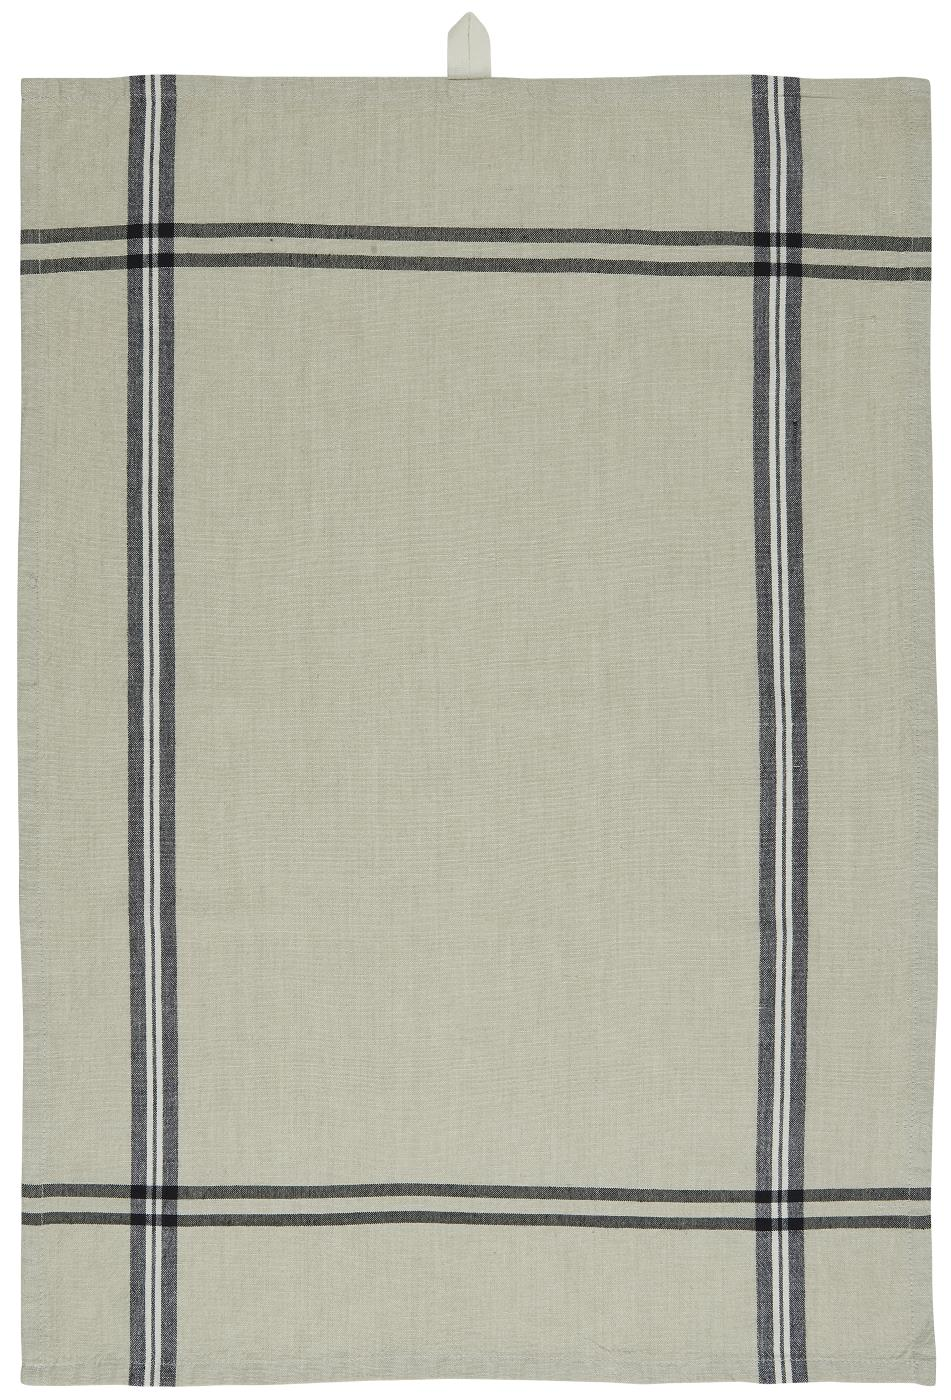 Ib Laursen, keittiöpyyhe, beige + mustat raidat